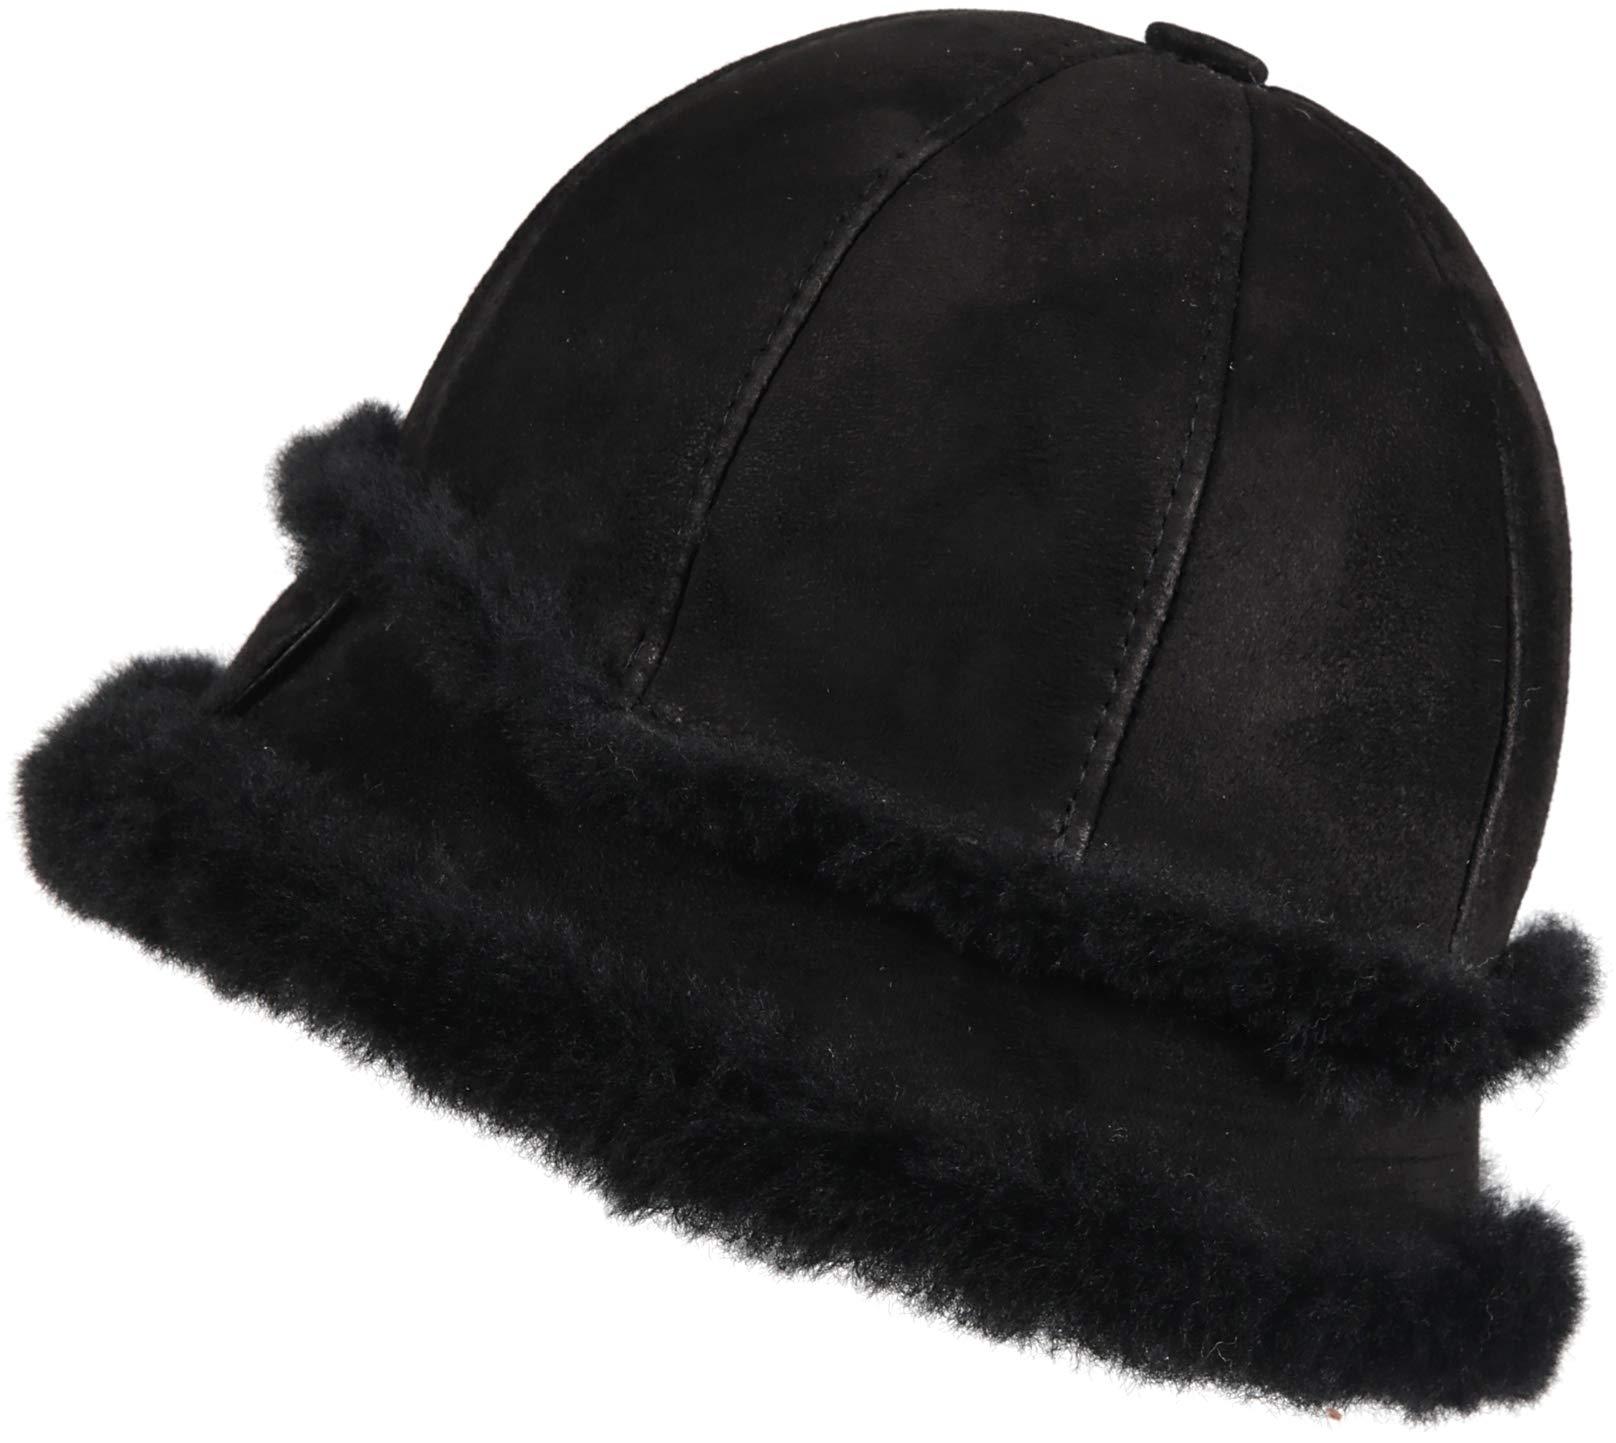 Zavelio Women's Shearling Sheepskin Winter Fur Bucket Beanie Hat Black Suede M by Zavelio